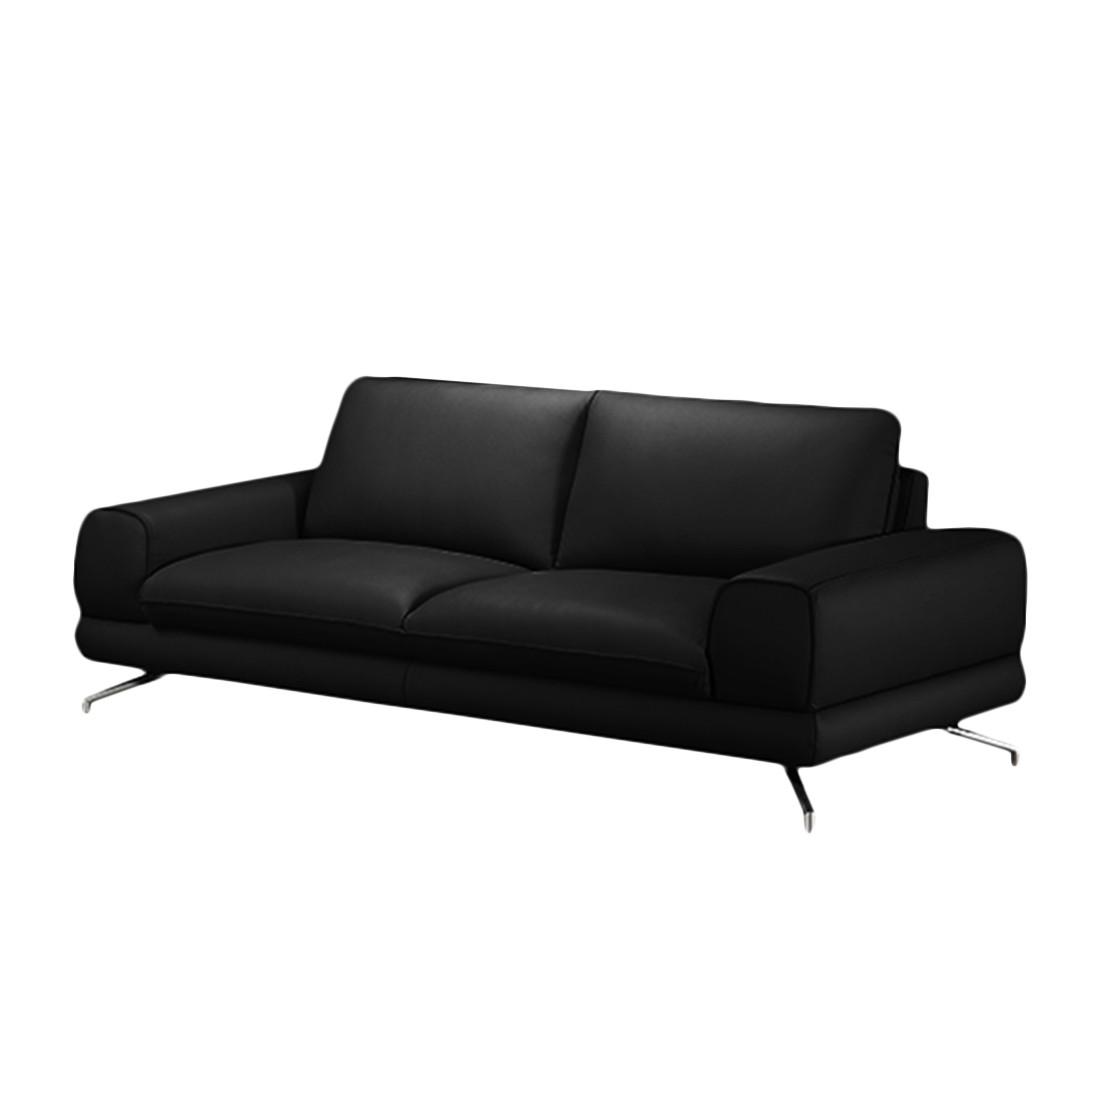 Sofa Lennard (3-Sitzer) - Echtleder - Ohne Kopfstütze - Schwarz, loftscape